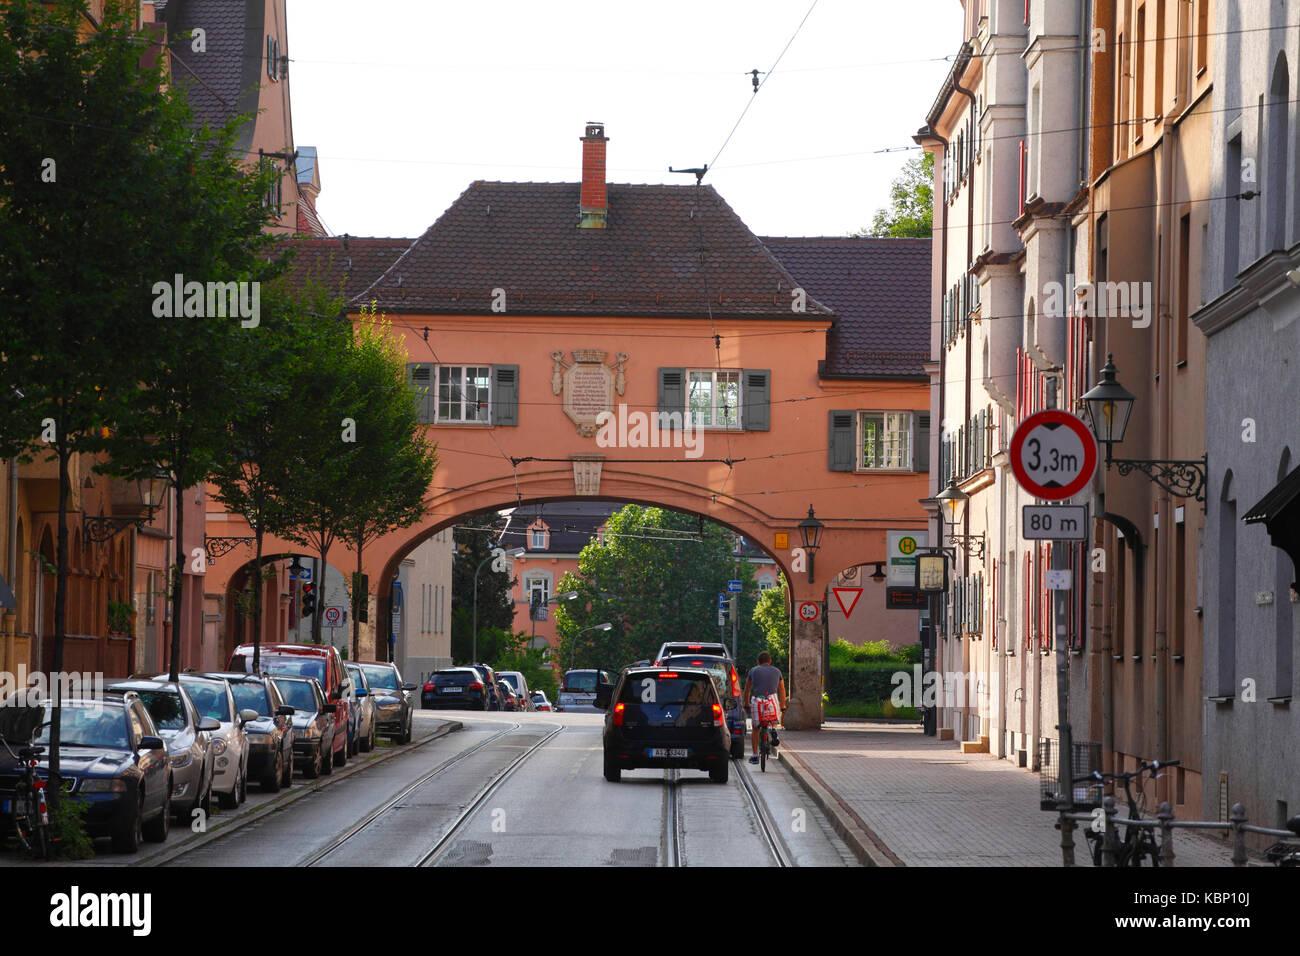 Fischertor Town Gate, Old Town, Augsburg, Swabian, Bavaria, Germany, Europe - Stock Image